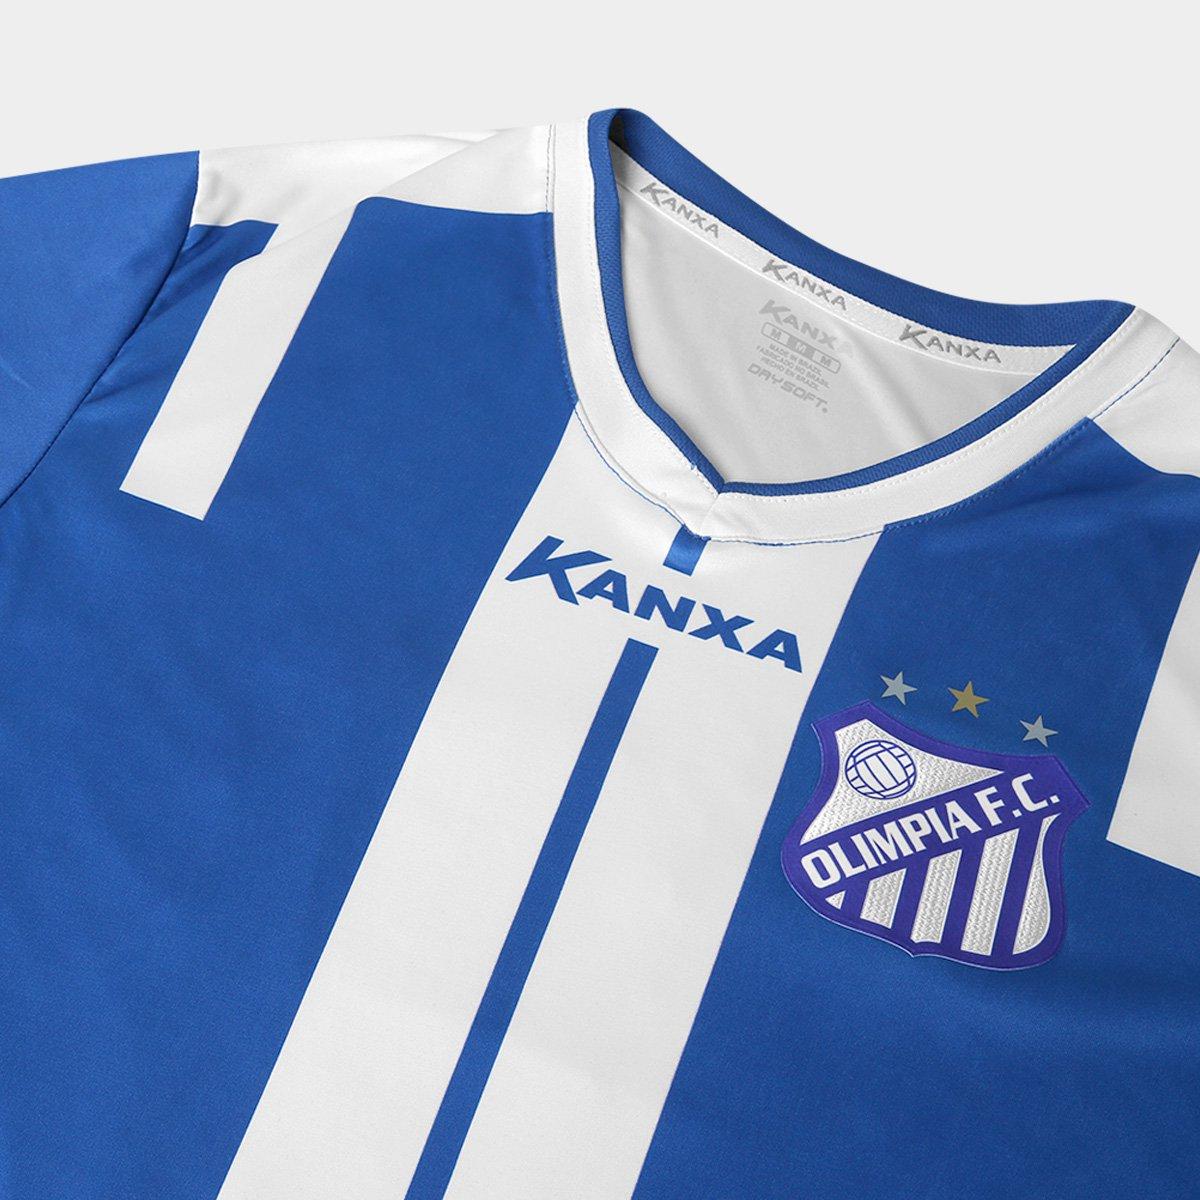 Camisa Olímpia I 2017 nº 10 - Torcedor Kanxa Masculina - Compre ... 63be340ce1daf